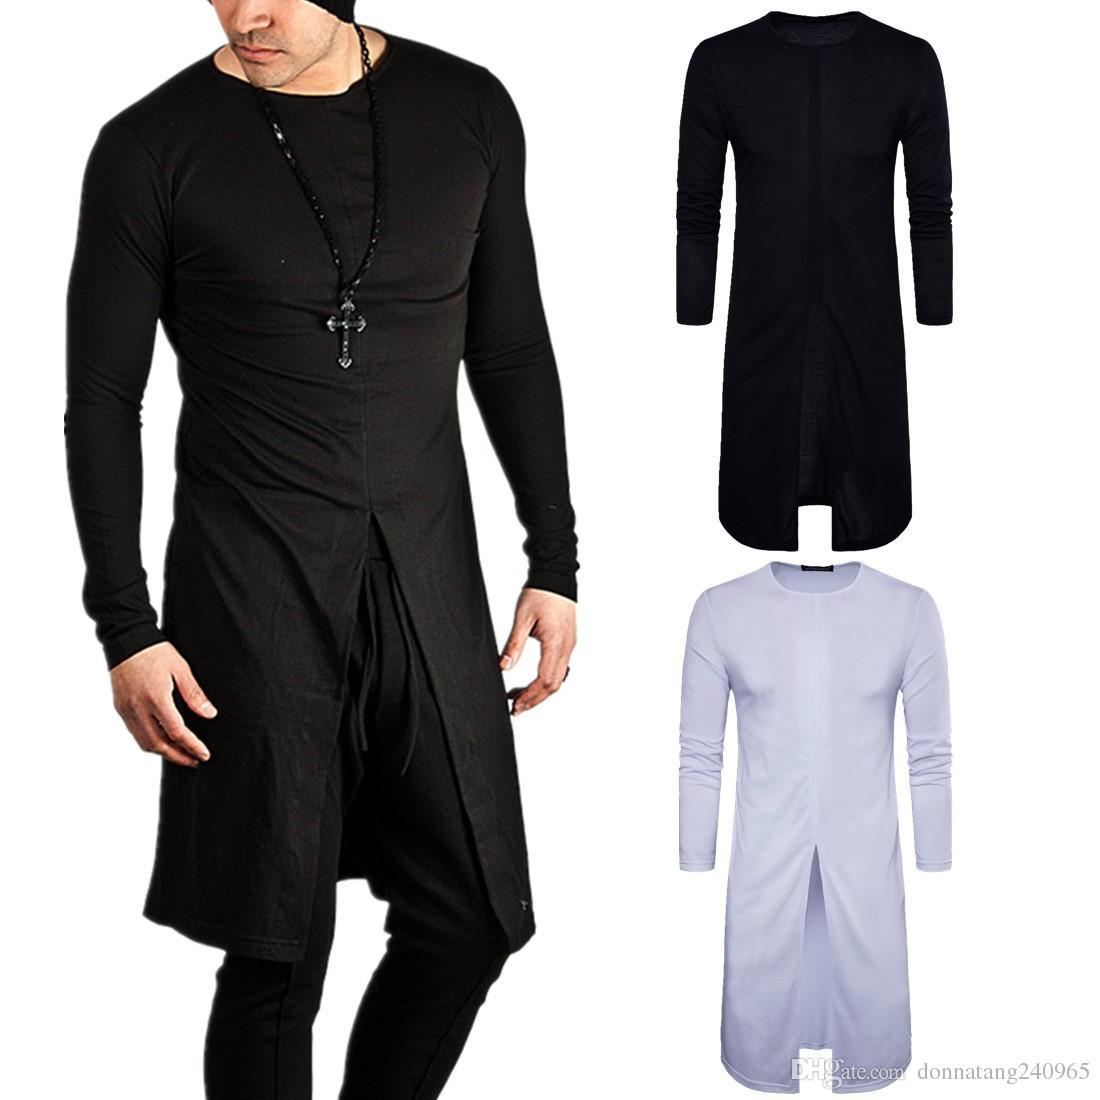 2017 New Fashion Designer Men Autumn Style Men Split T Shirt Slim Style Hip Hop Long Sleeve T Shirts Clothes Long Tshirt Make T Shirts Shirt Designs From Donnatang240965 10 89 Dhgate Com